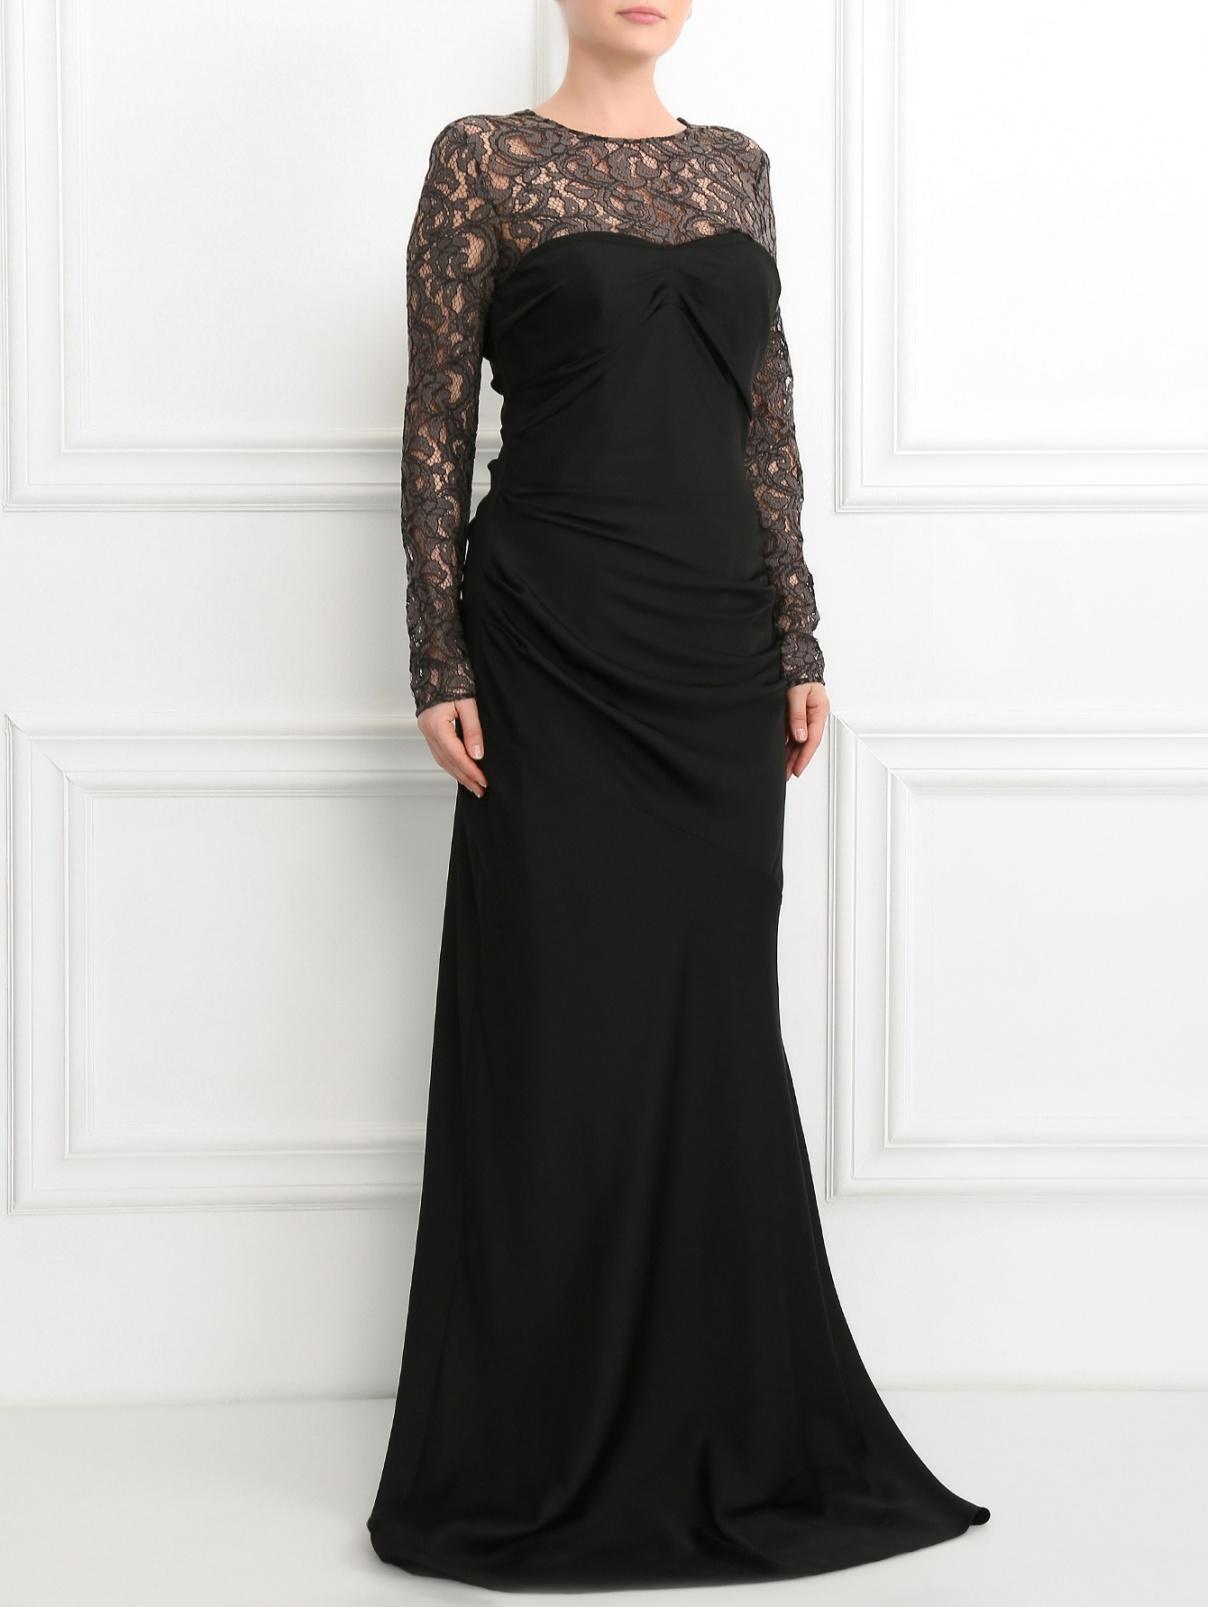 Платье-макси с кружевом Moschino Cheap&Chic  –  Модель Общий вид